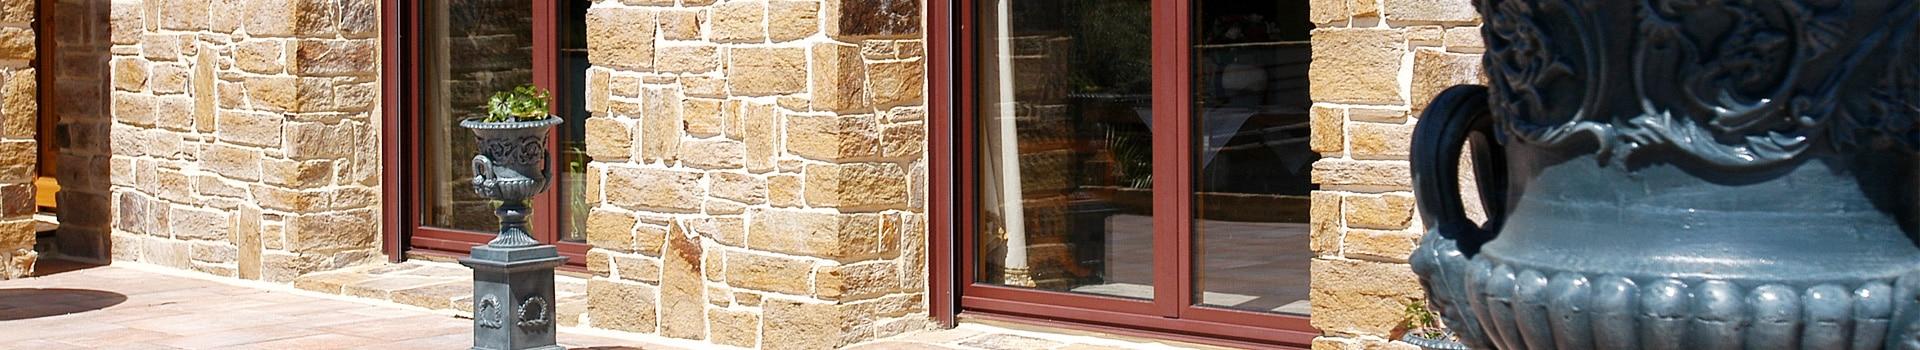 Portes fenêtres térasse